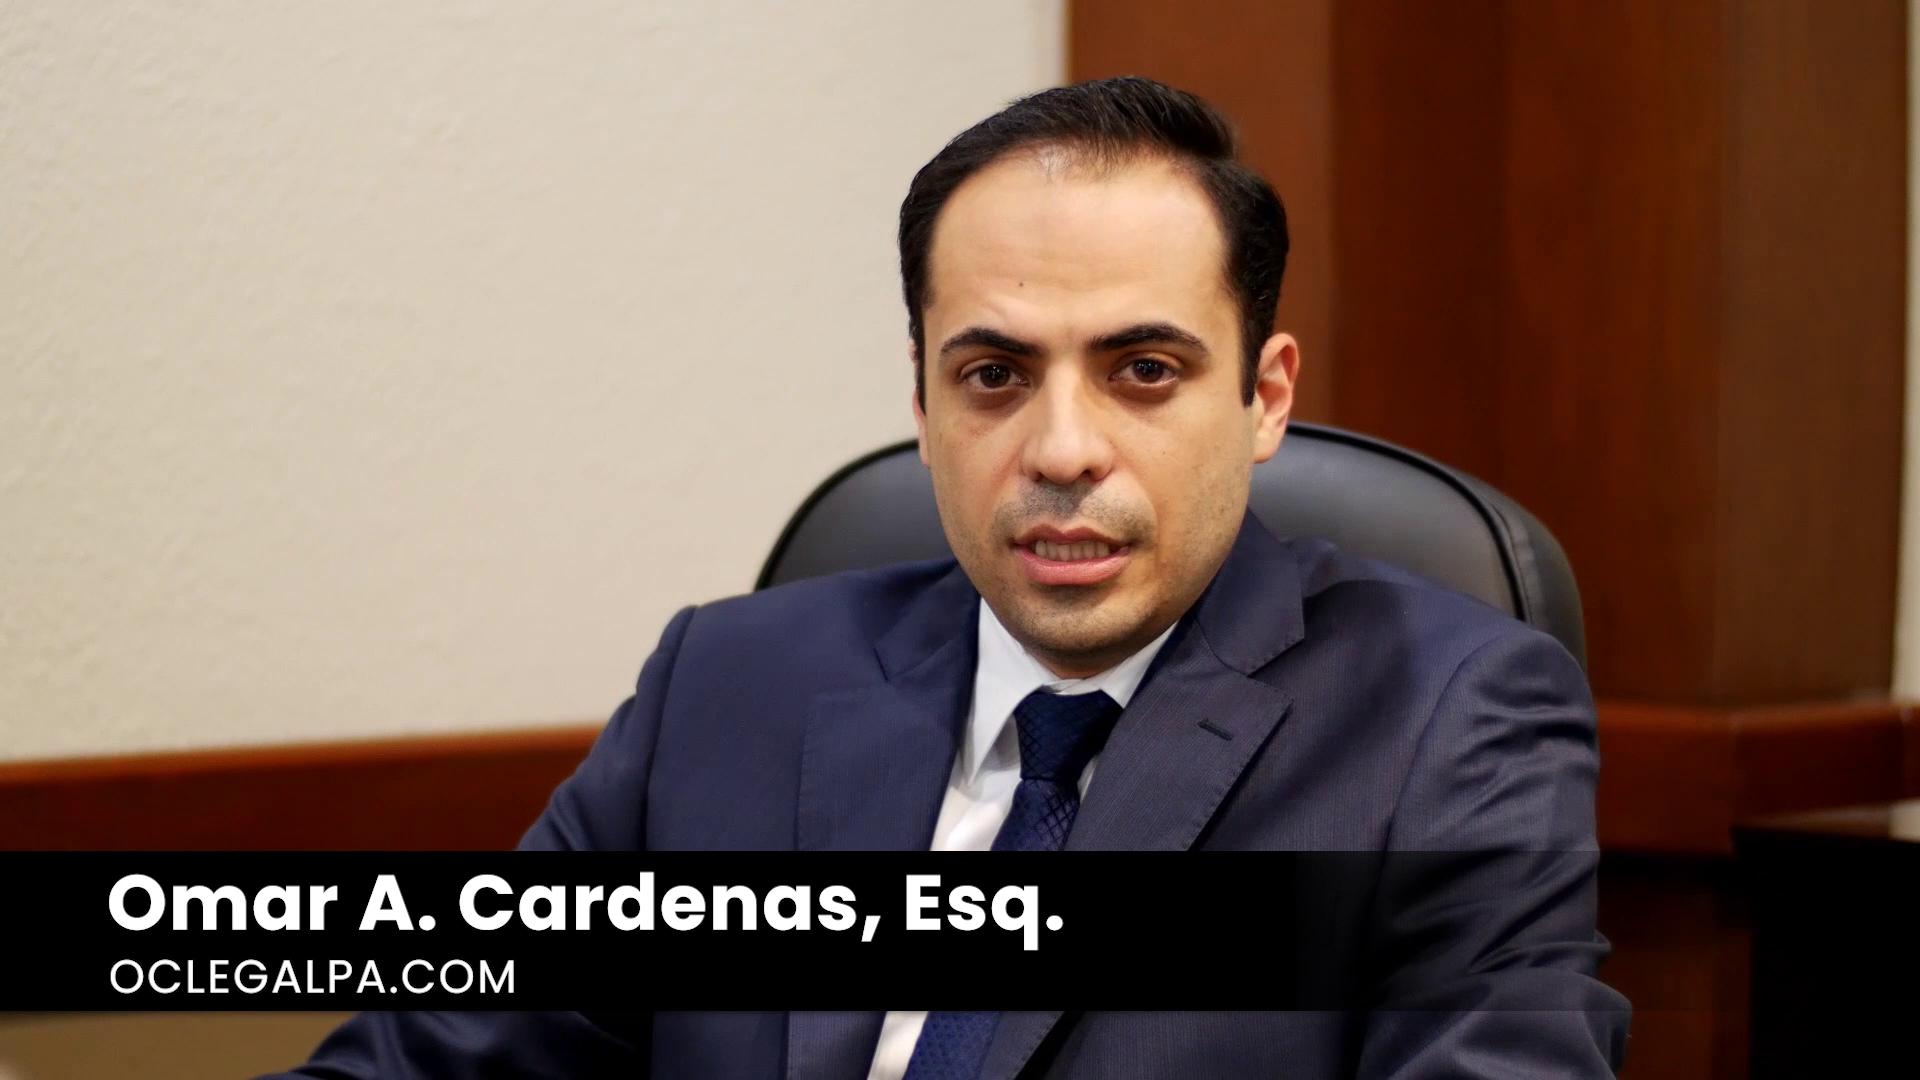 Meet Omar Cardenas, Esq.